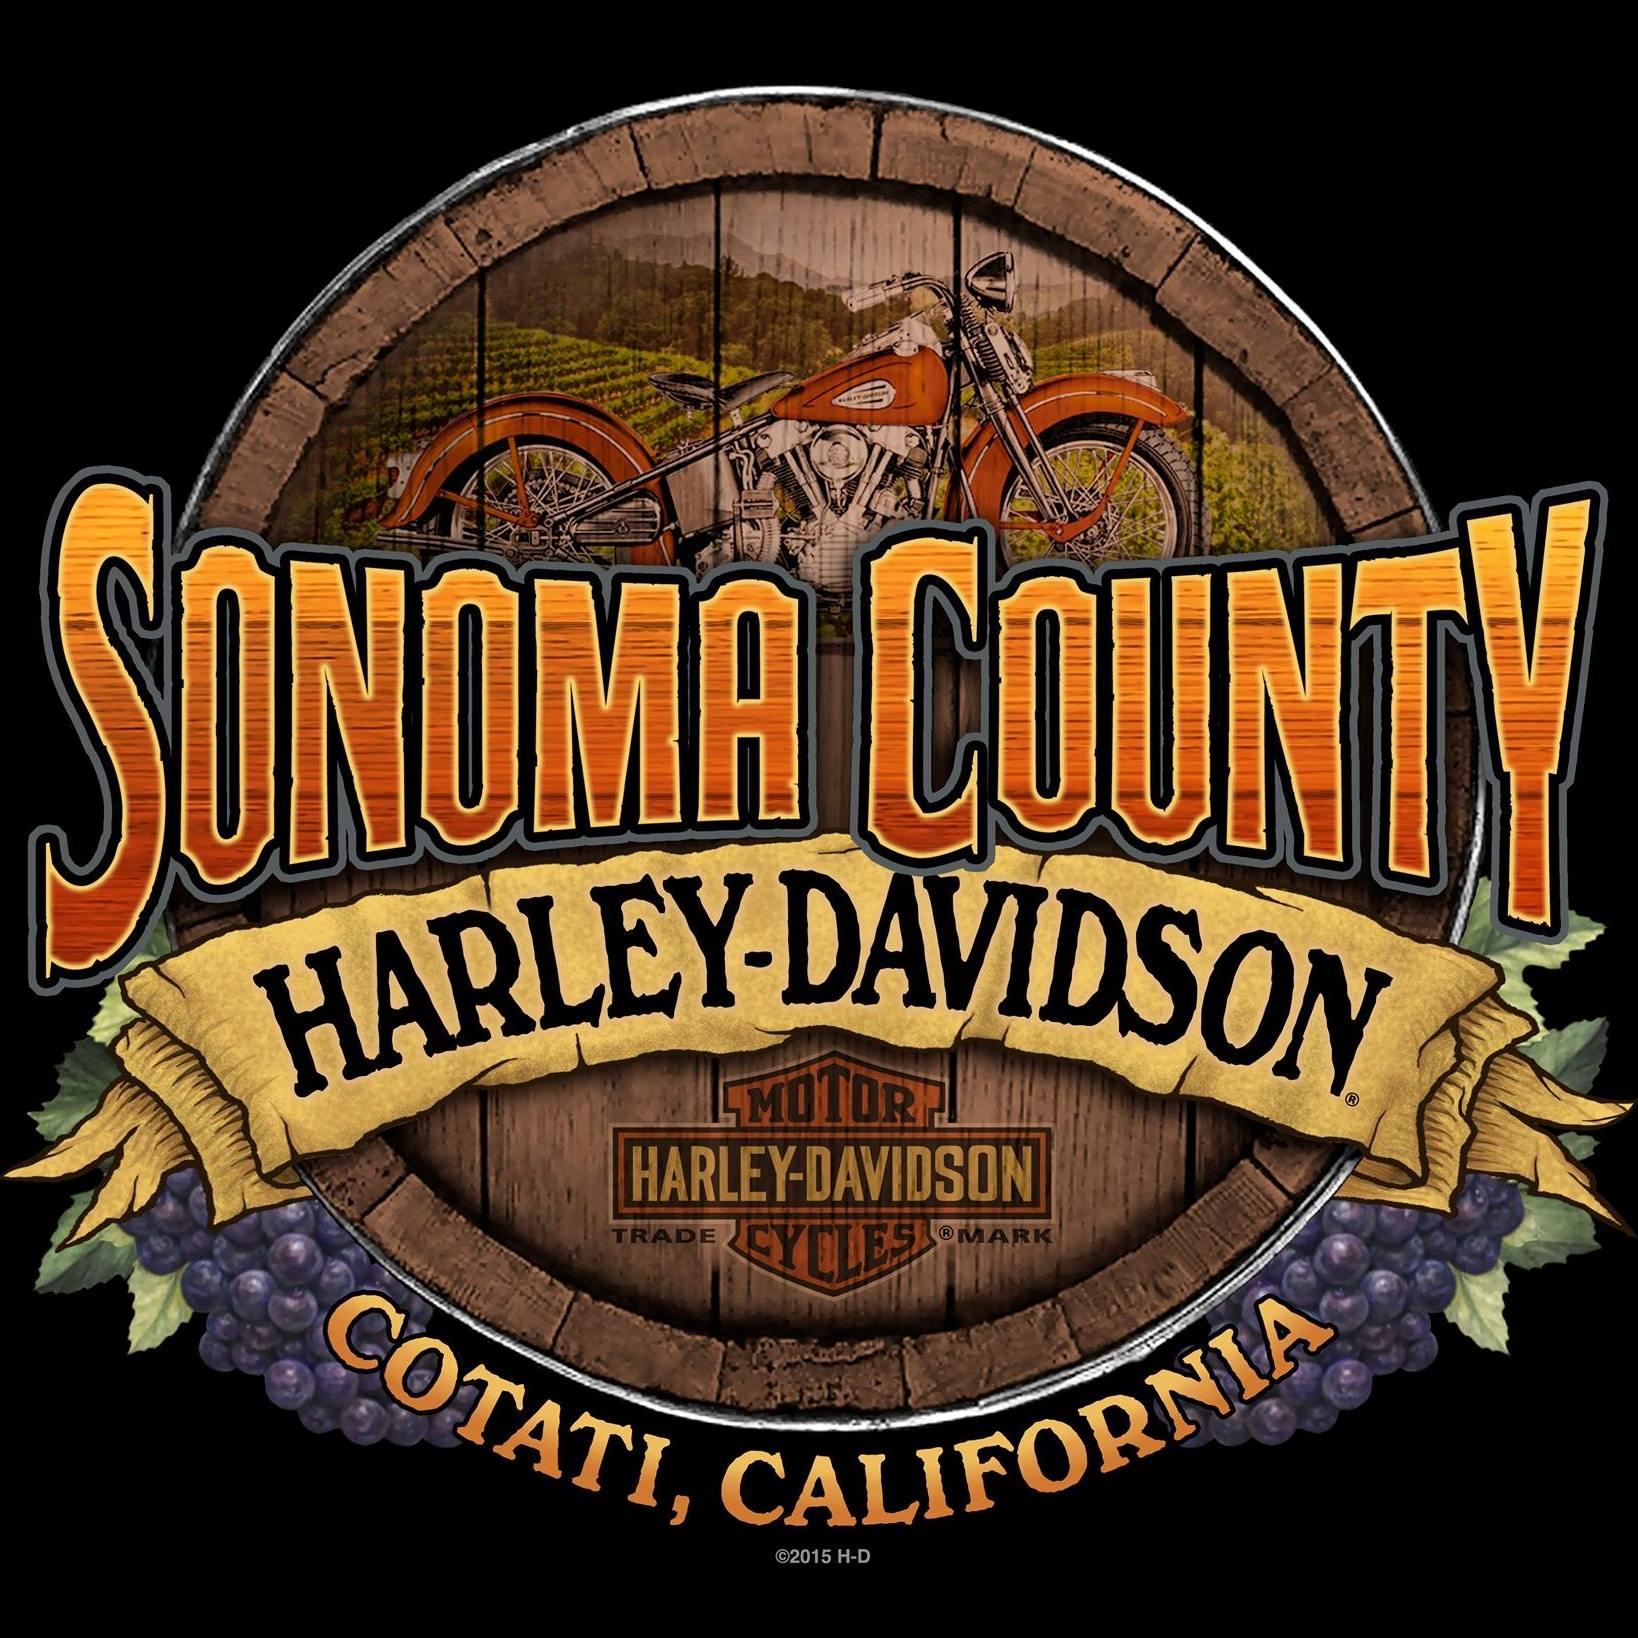 Sonoma County Harley Davidson Logo